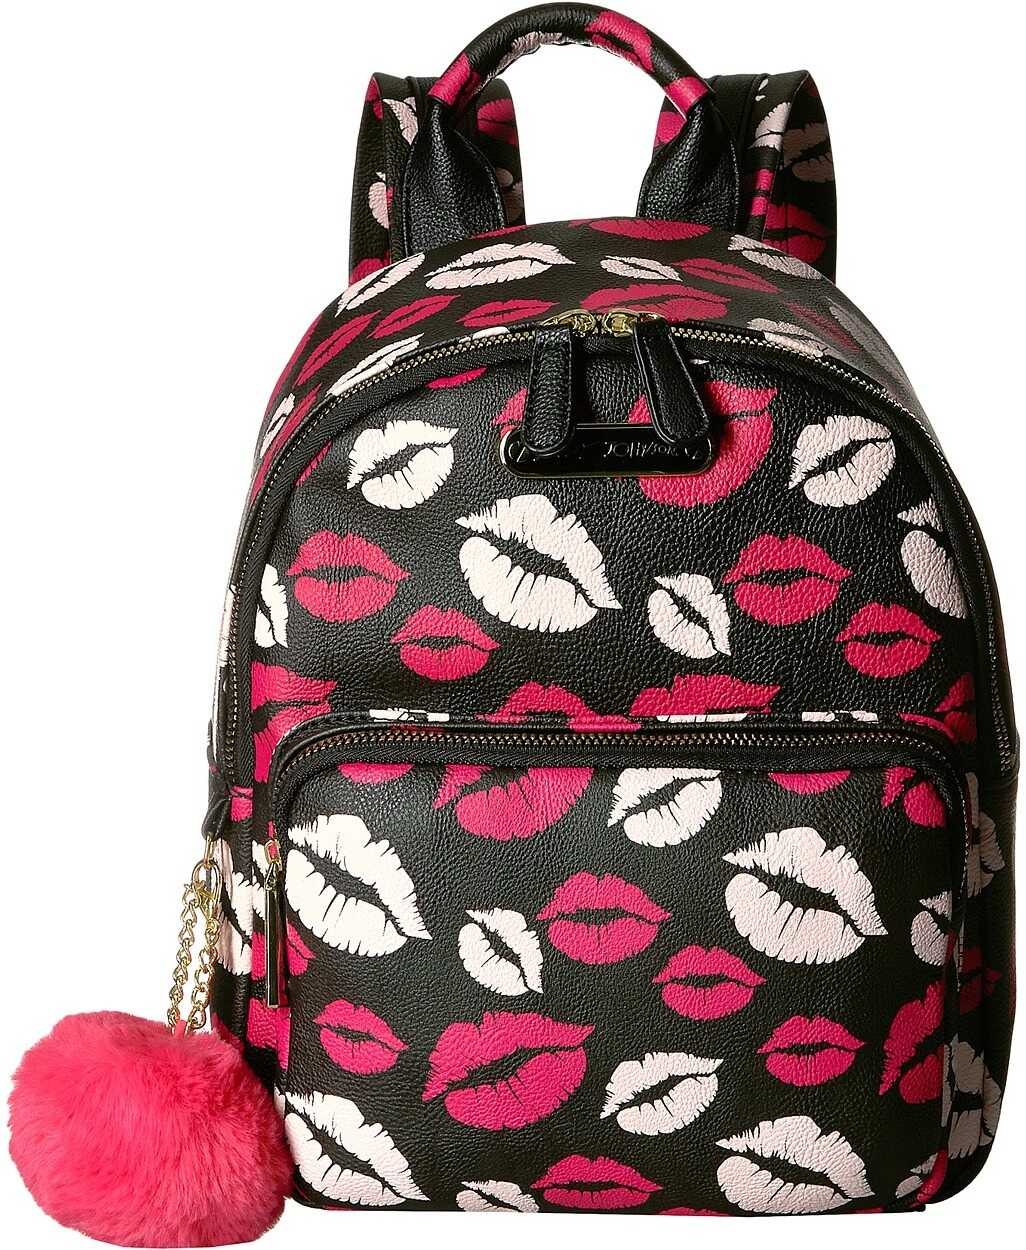 Betsey Johnson Medium Backpack Black Multi